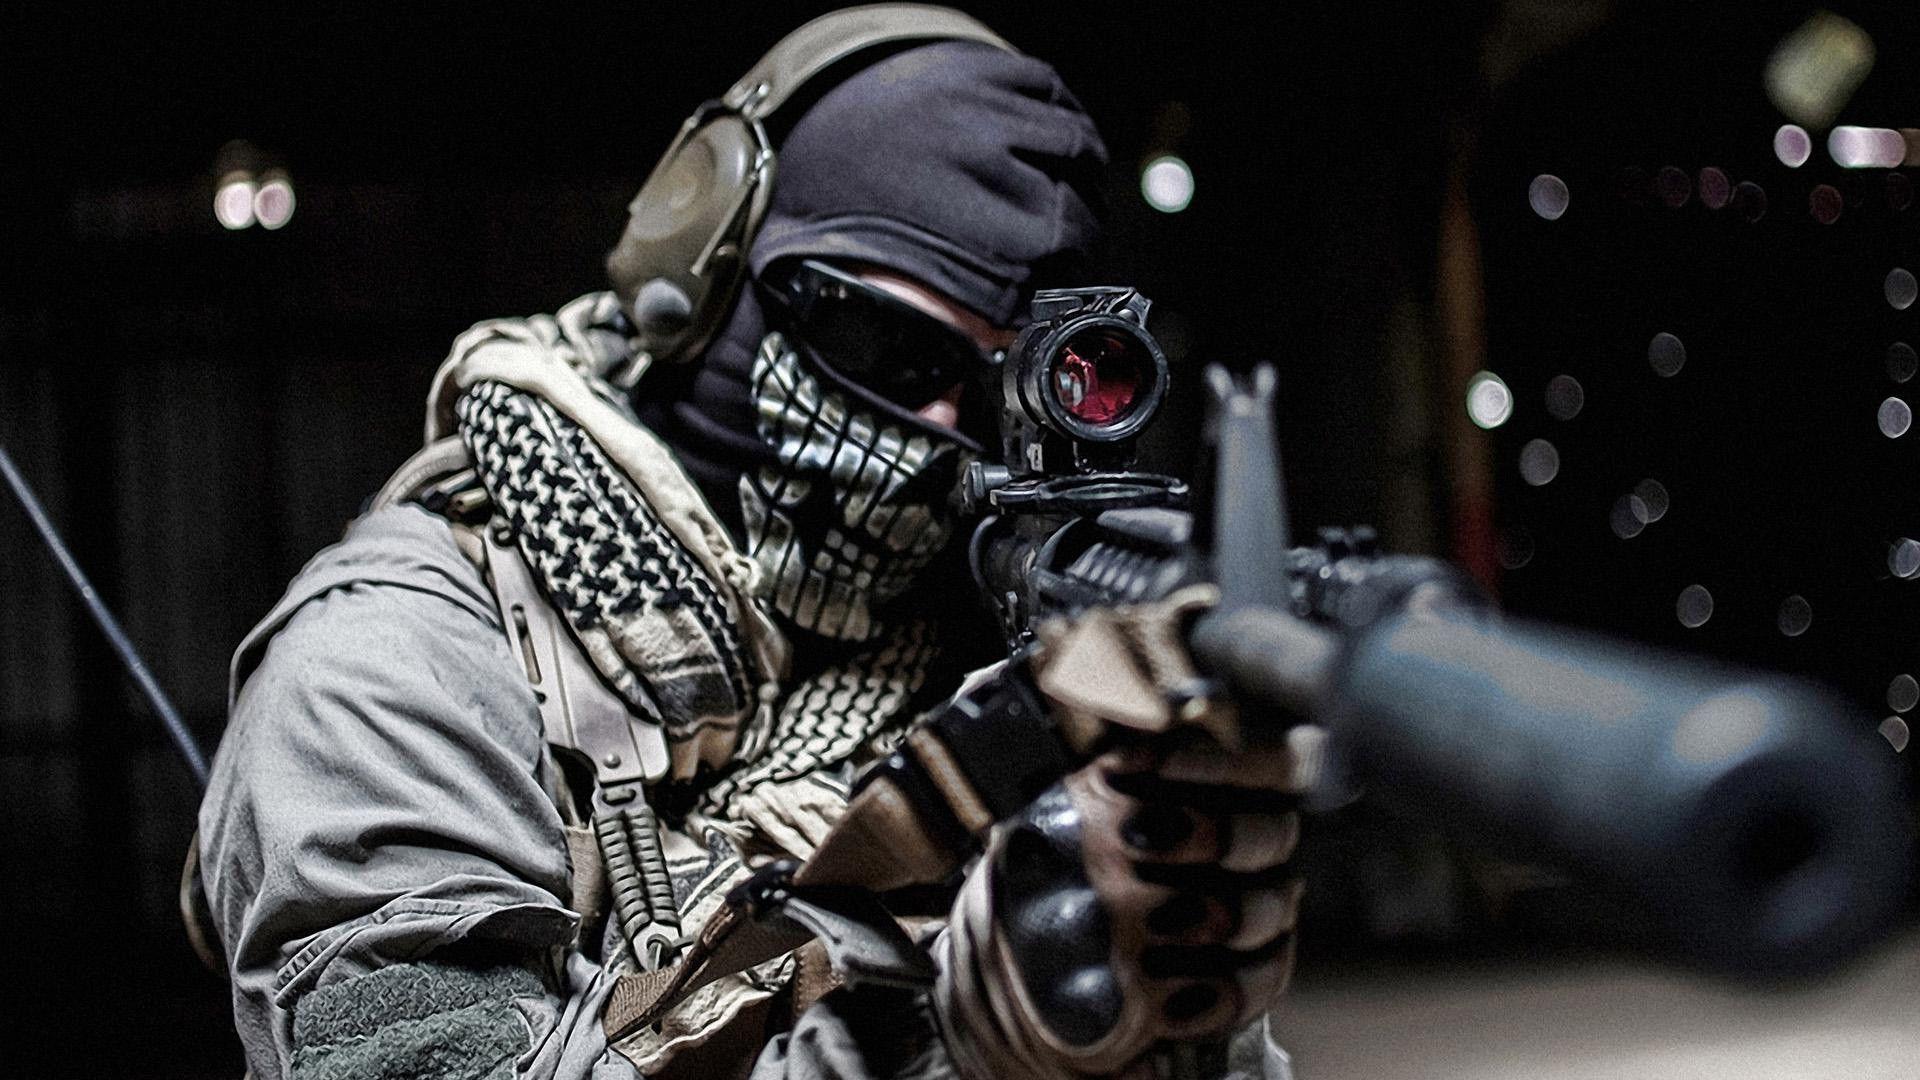 Call of Duty Modern Warfare HD Wallpapers Backgrounds